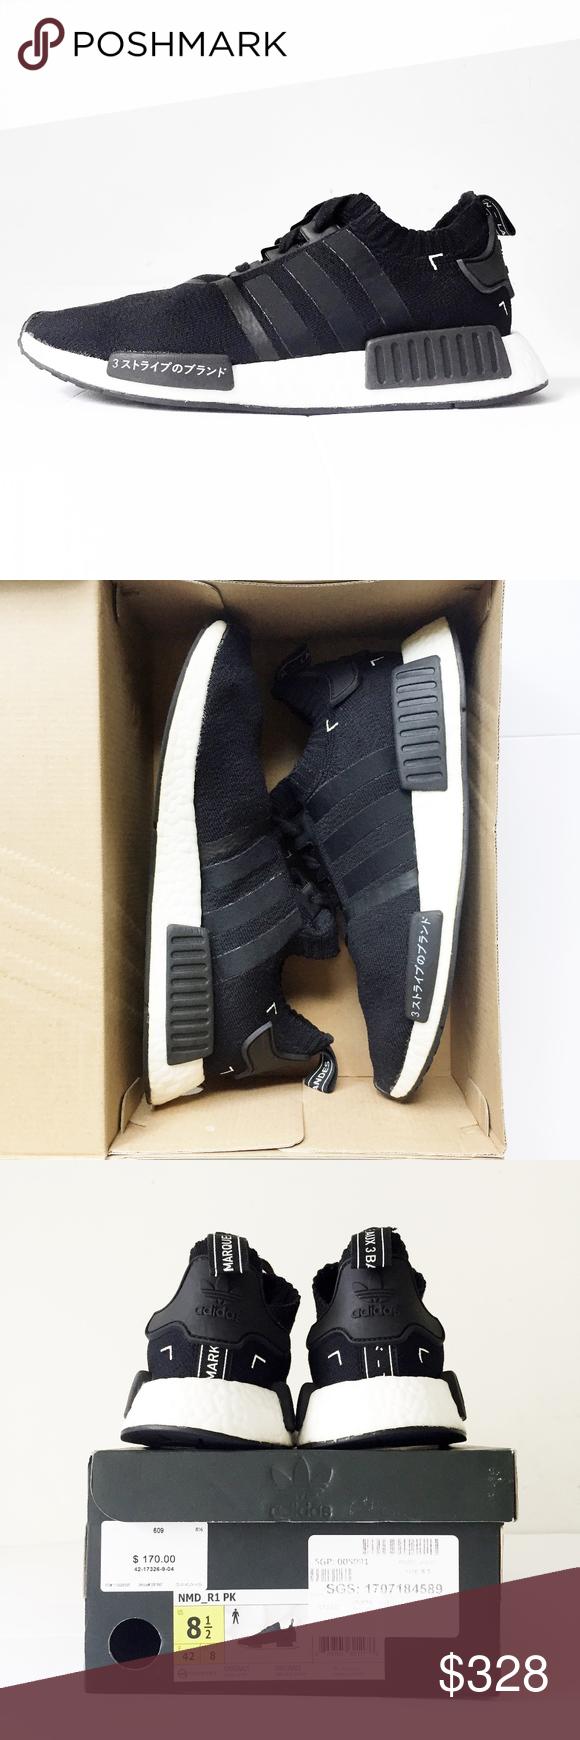 1f4cc6c1d ADIDAS NMD R1 JAPAN BOOST PK black shoes sneakers ADIDAS ORIGINALS NMD R1  PK S81847 men s